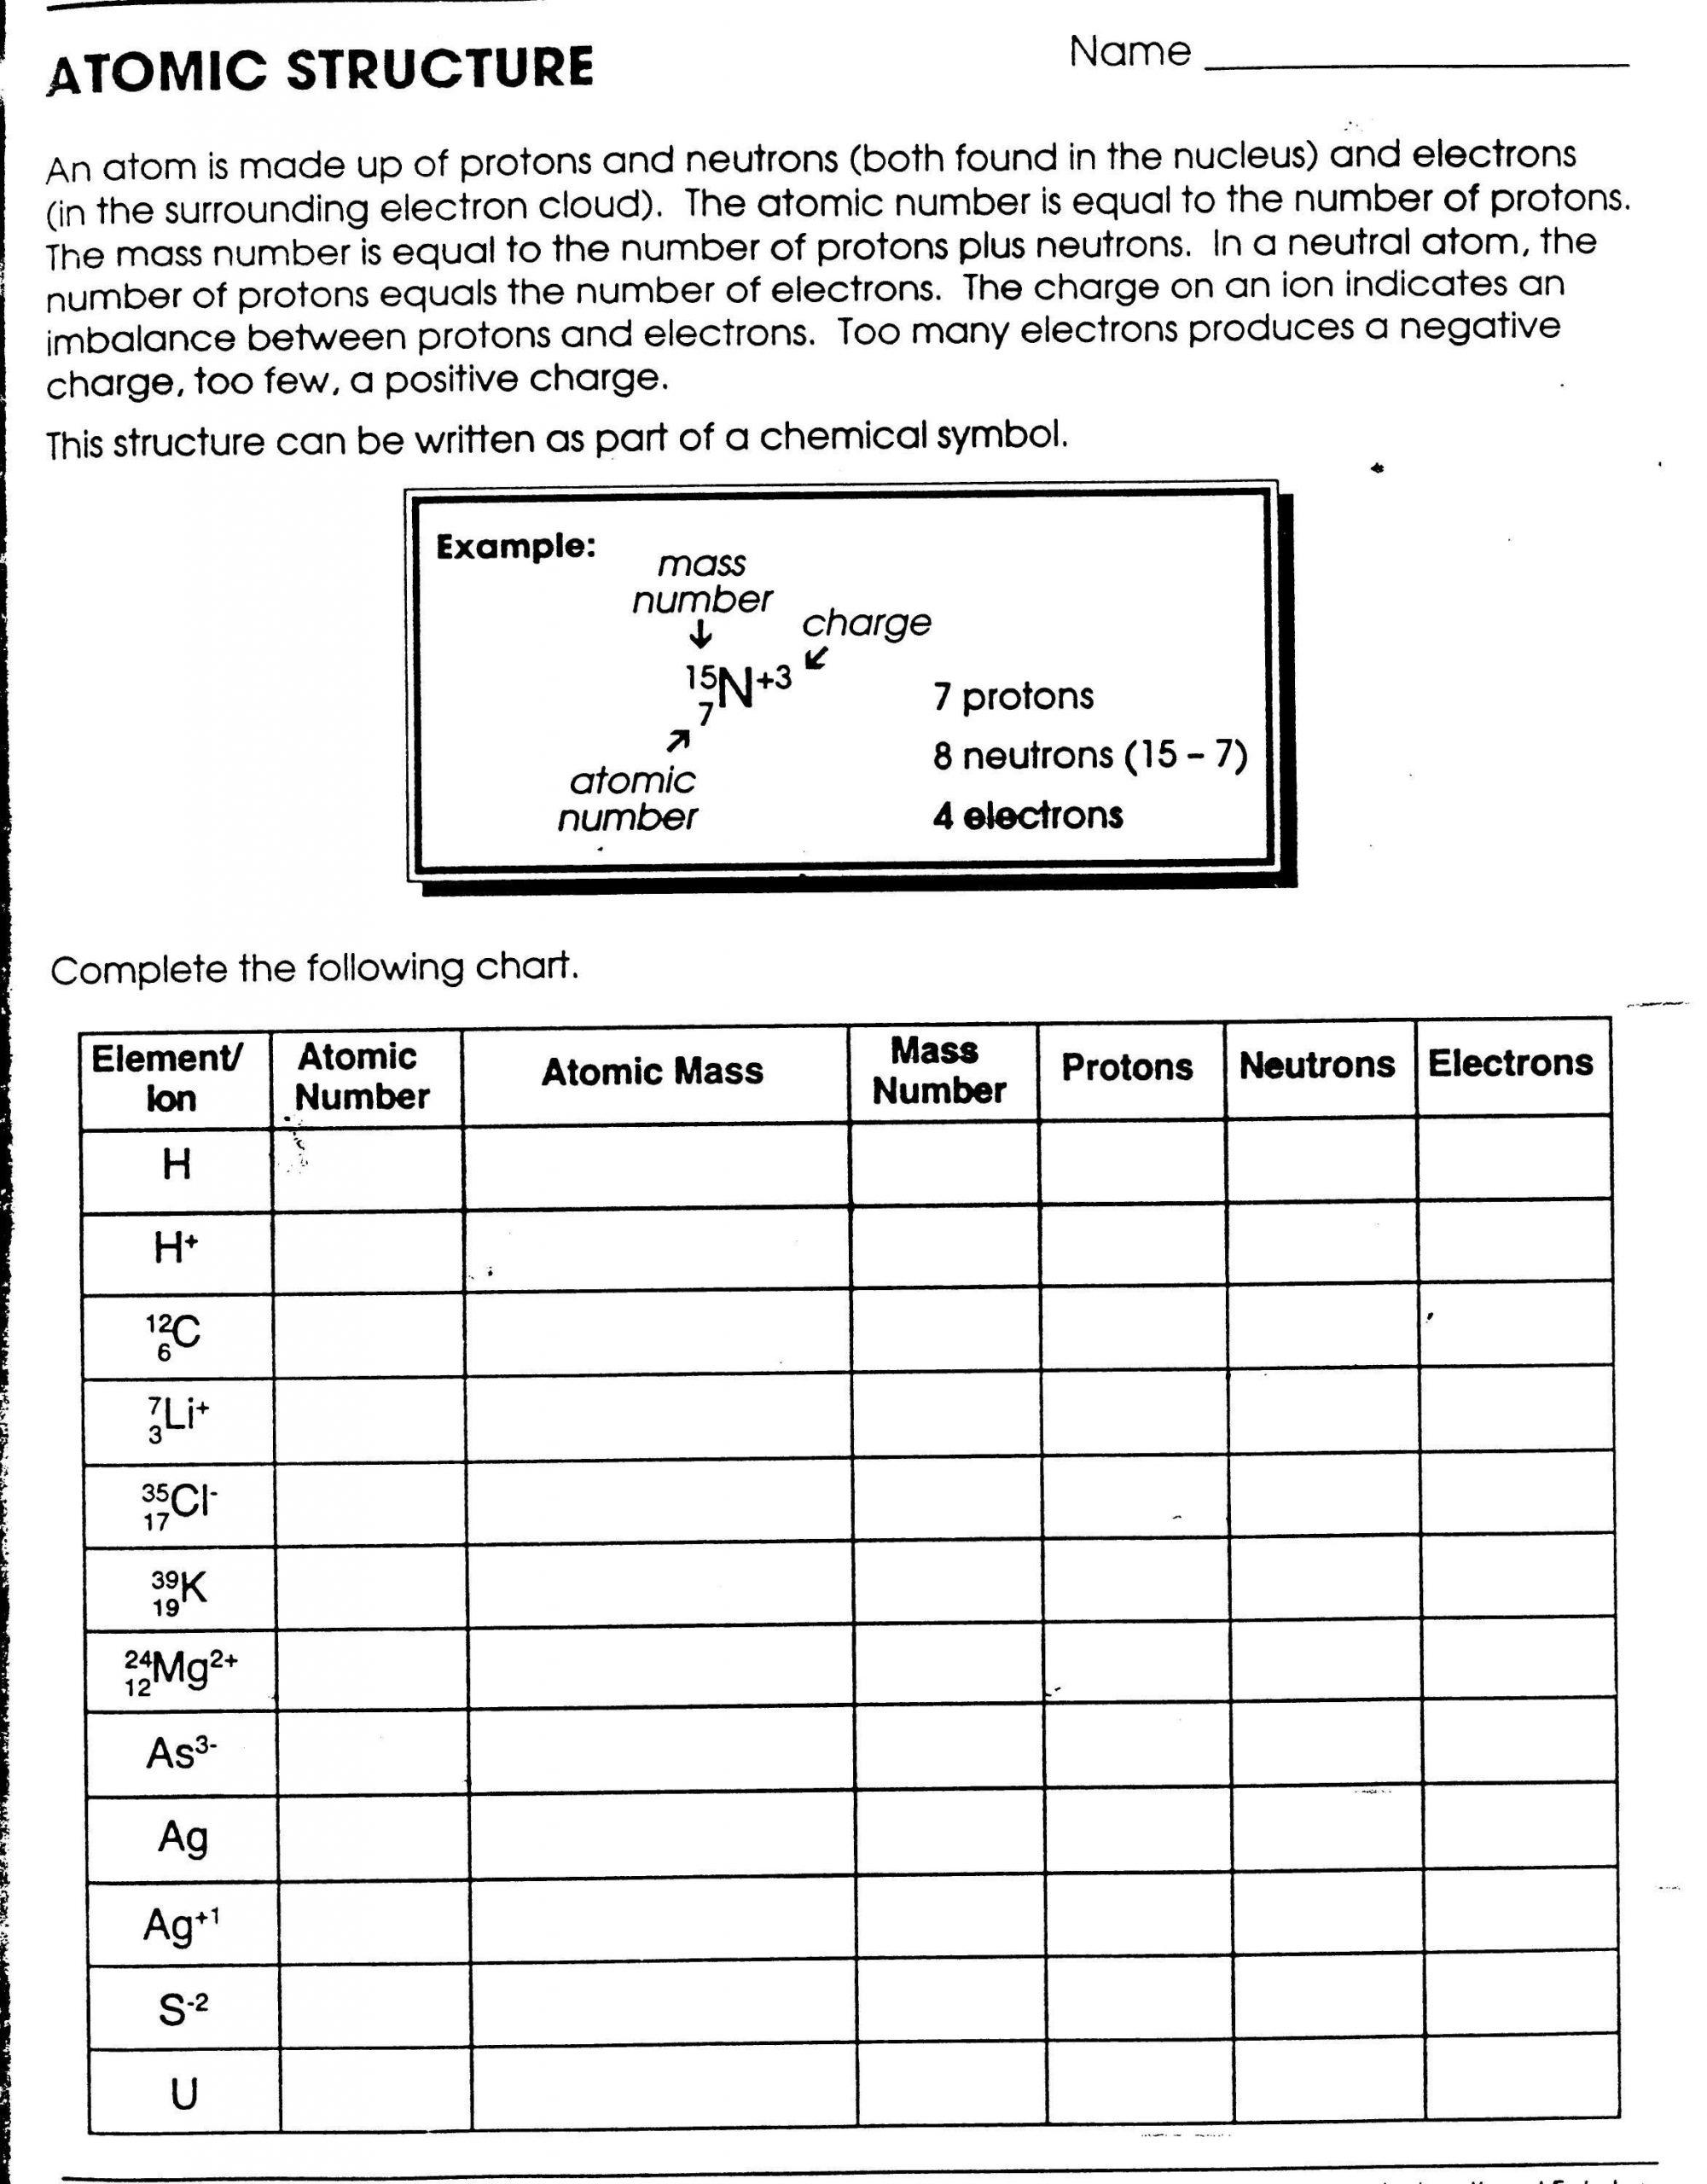 Atomic Structure Worksheet Answer Key Printables atomic Structure Worksheet Gozoneguide